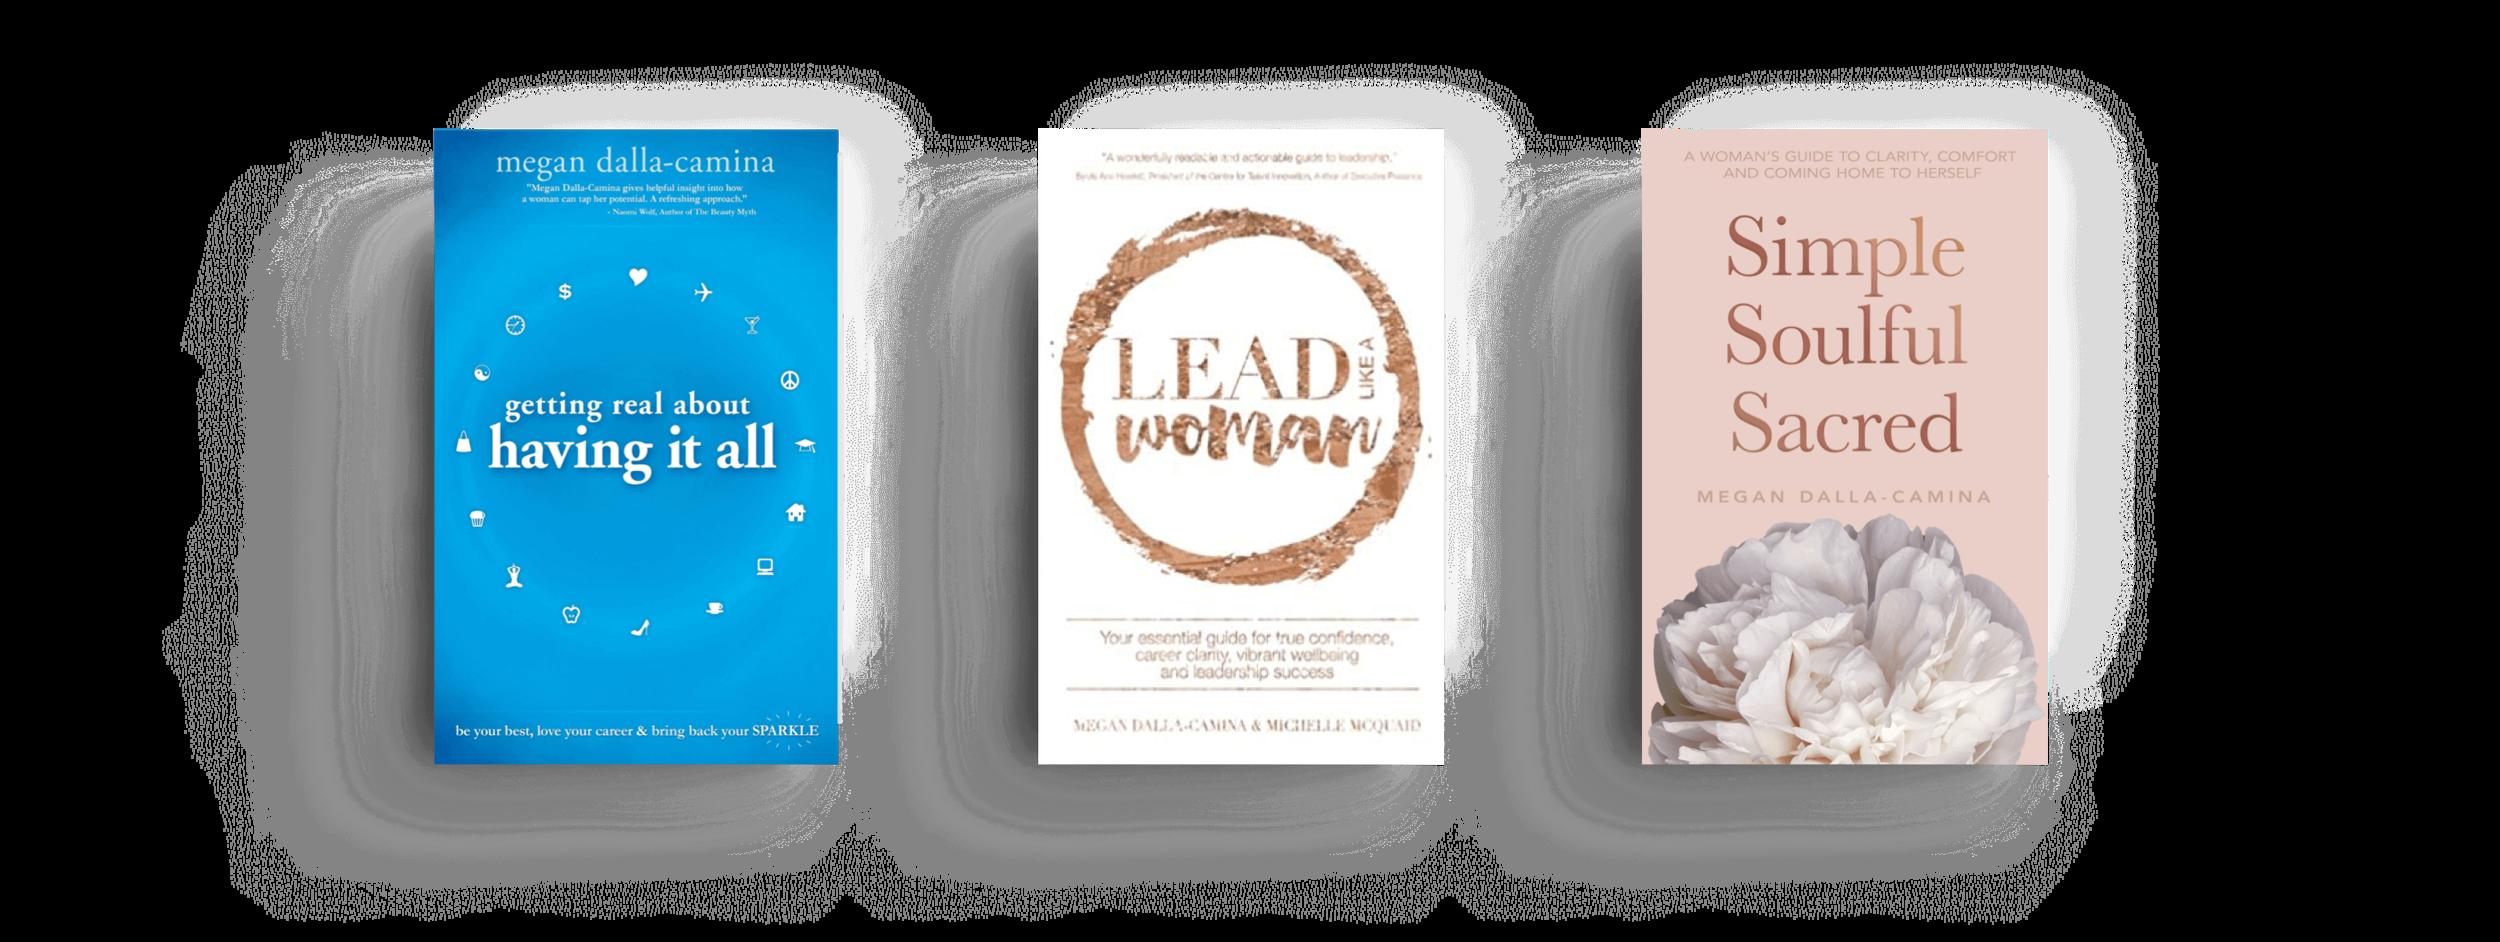 MeganDallaCamina-SSS-MockUp-BooksAll.png